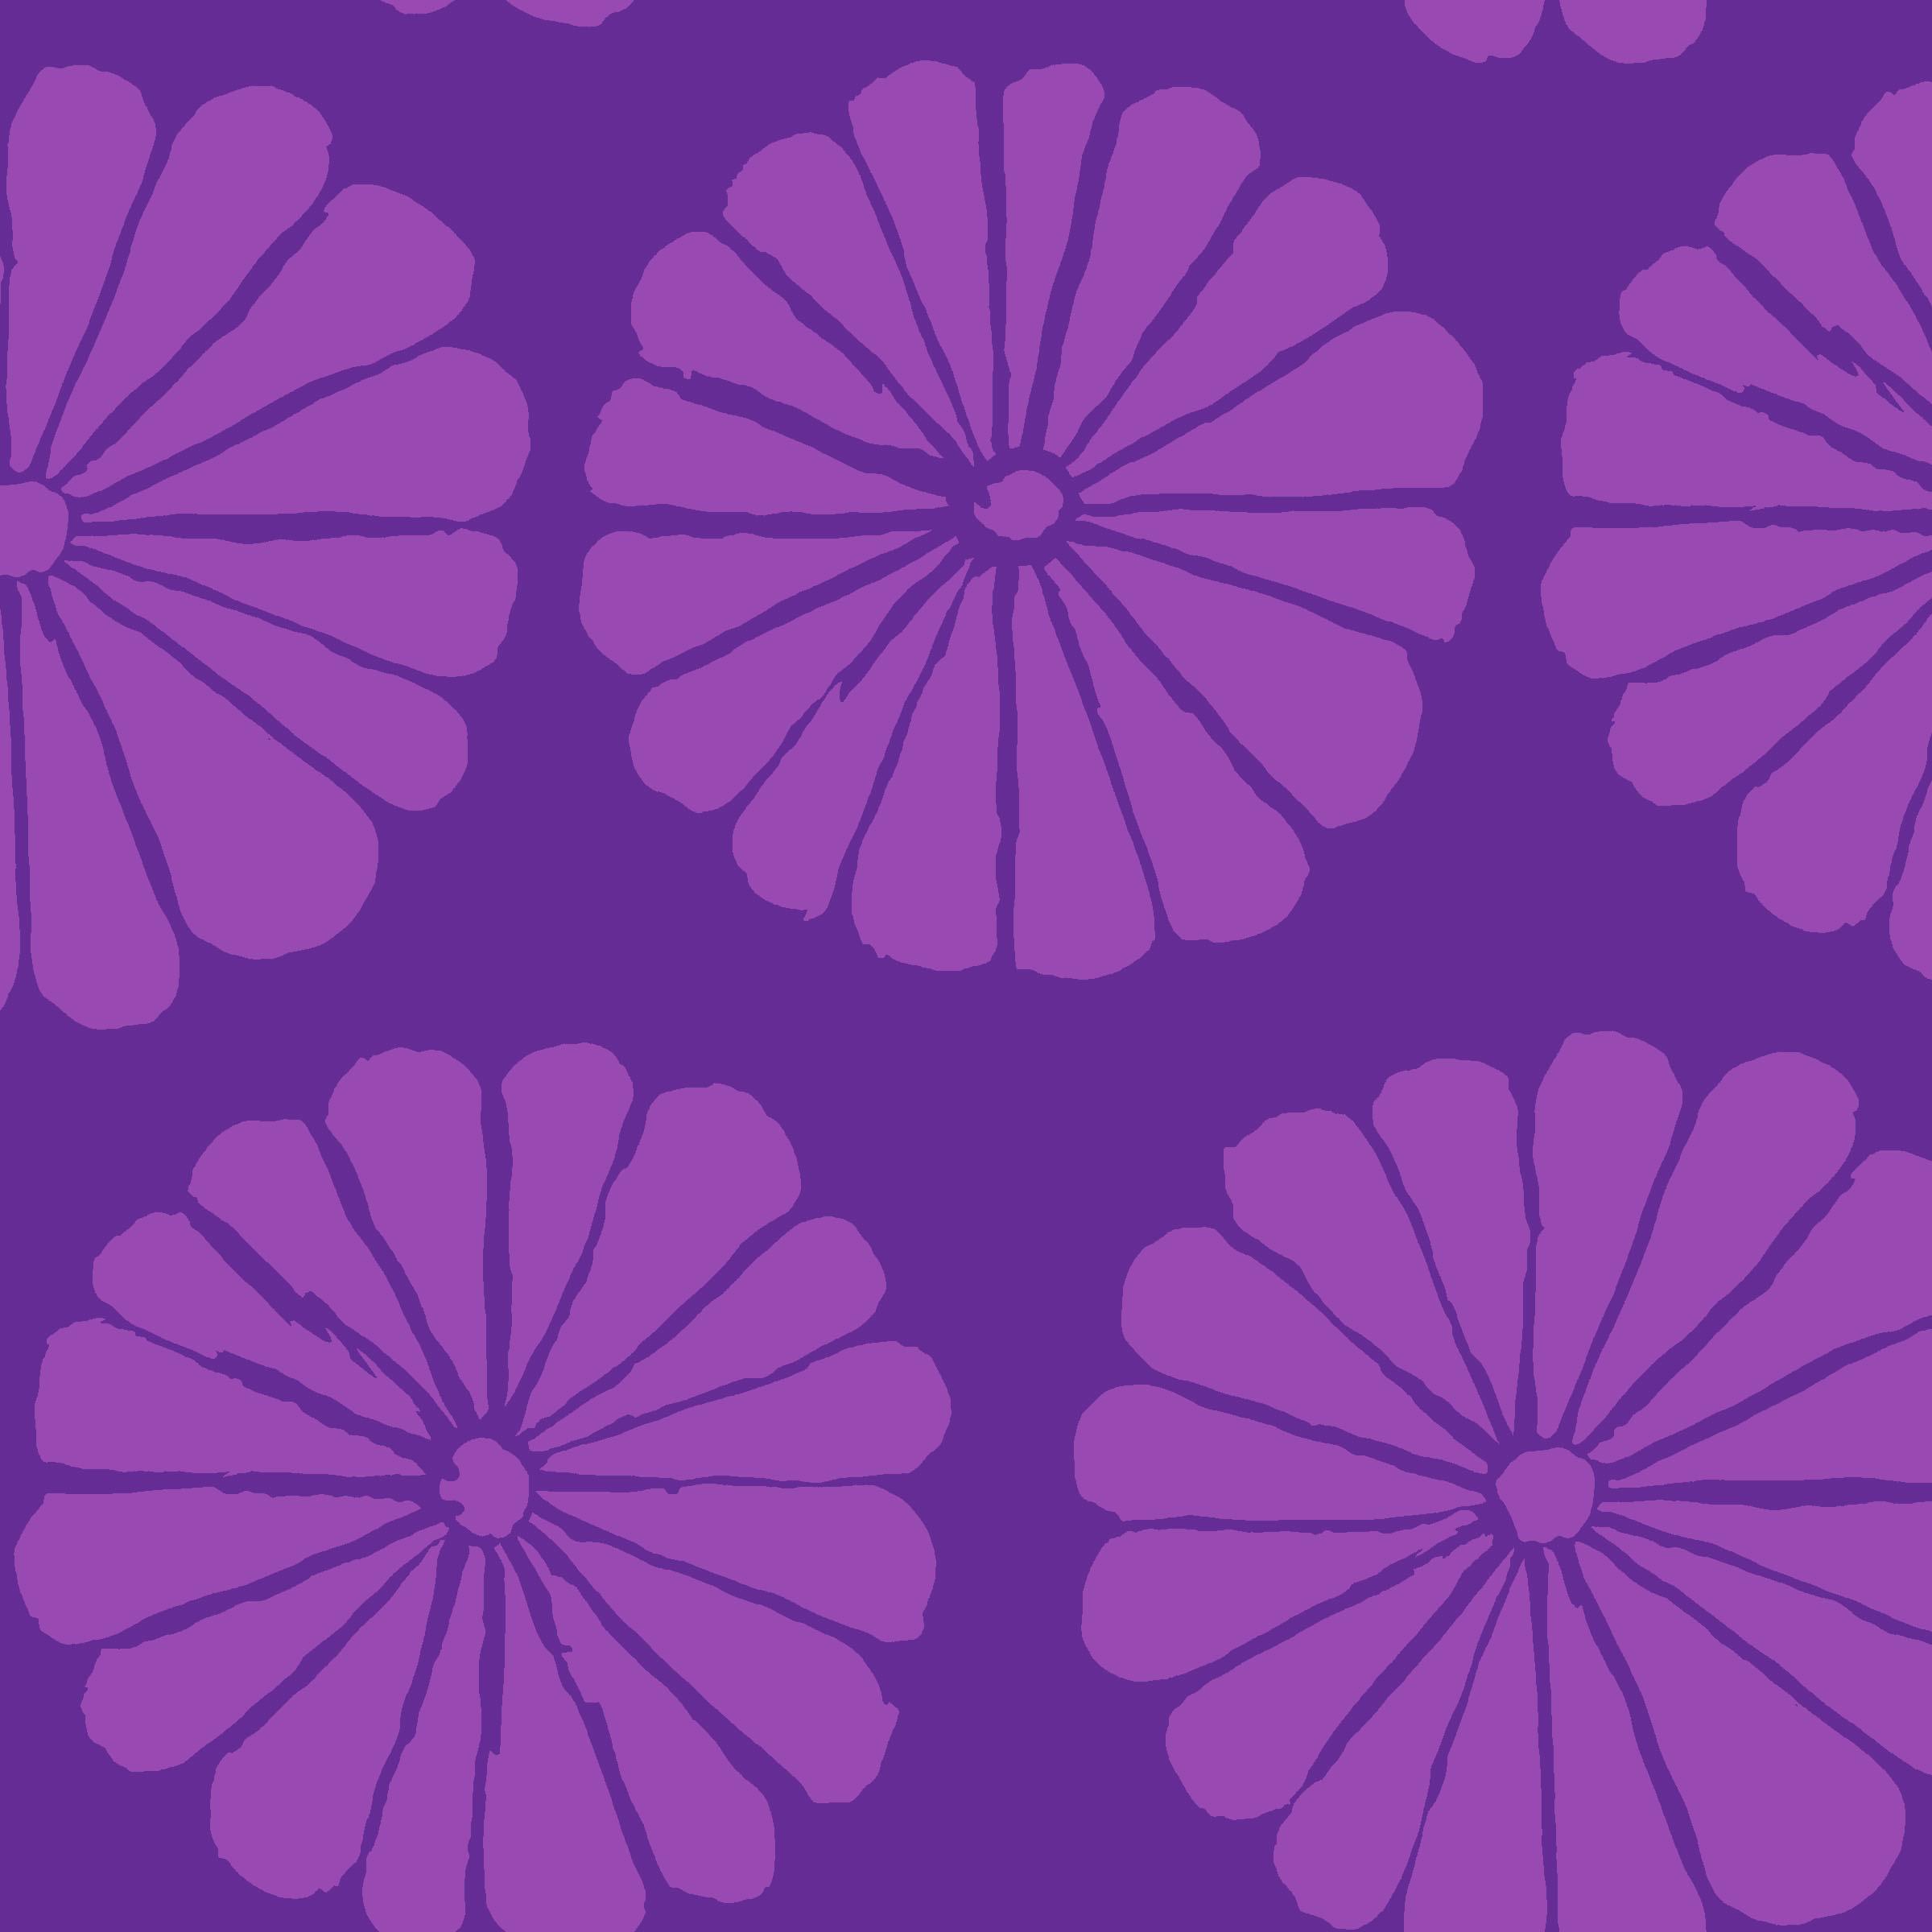 Damask Flower - PWGP183 - Purple